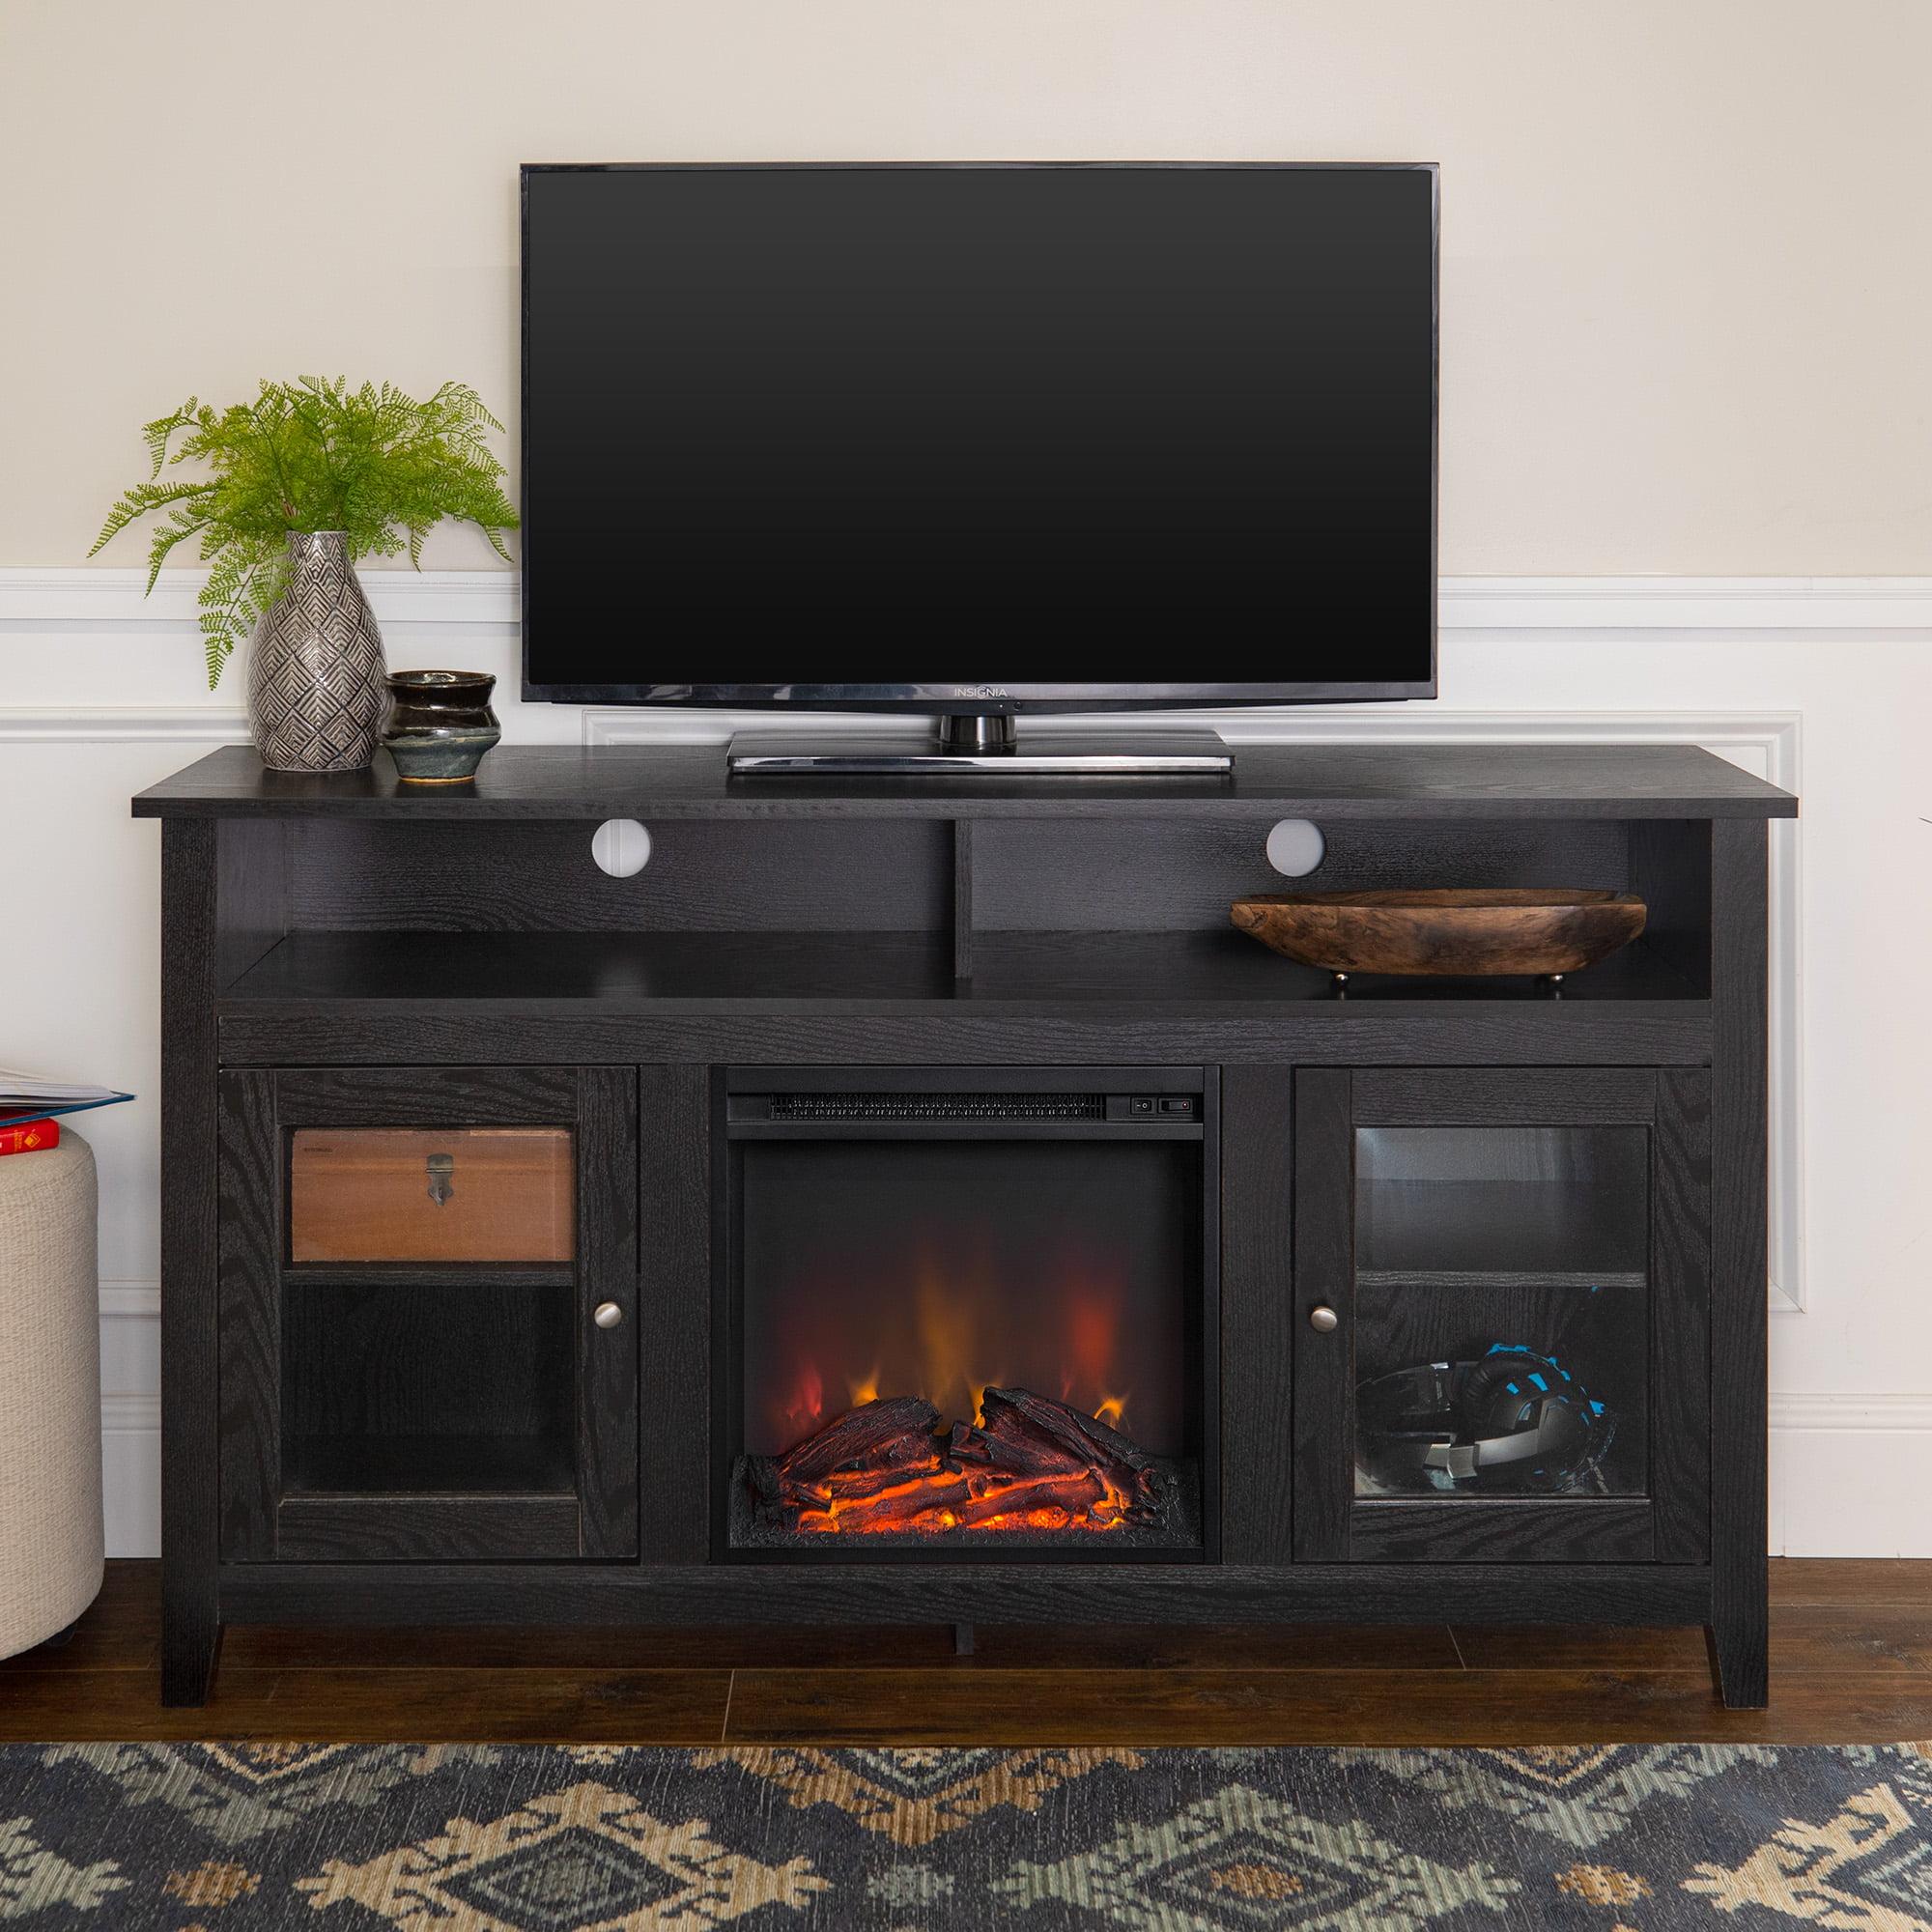 Walker Edison AZ58FP18HBES 58 Wood Highboy Style TV Stand Fireplac Console Espresso